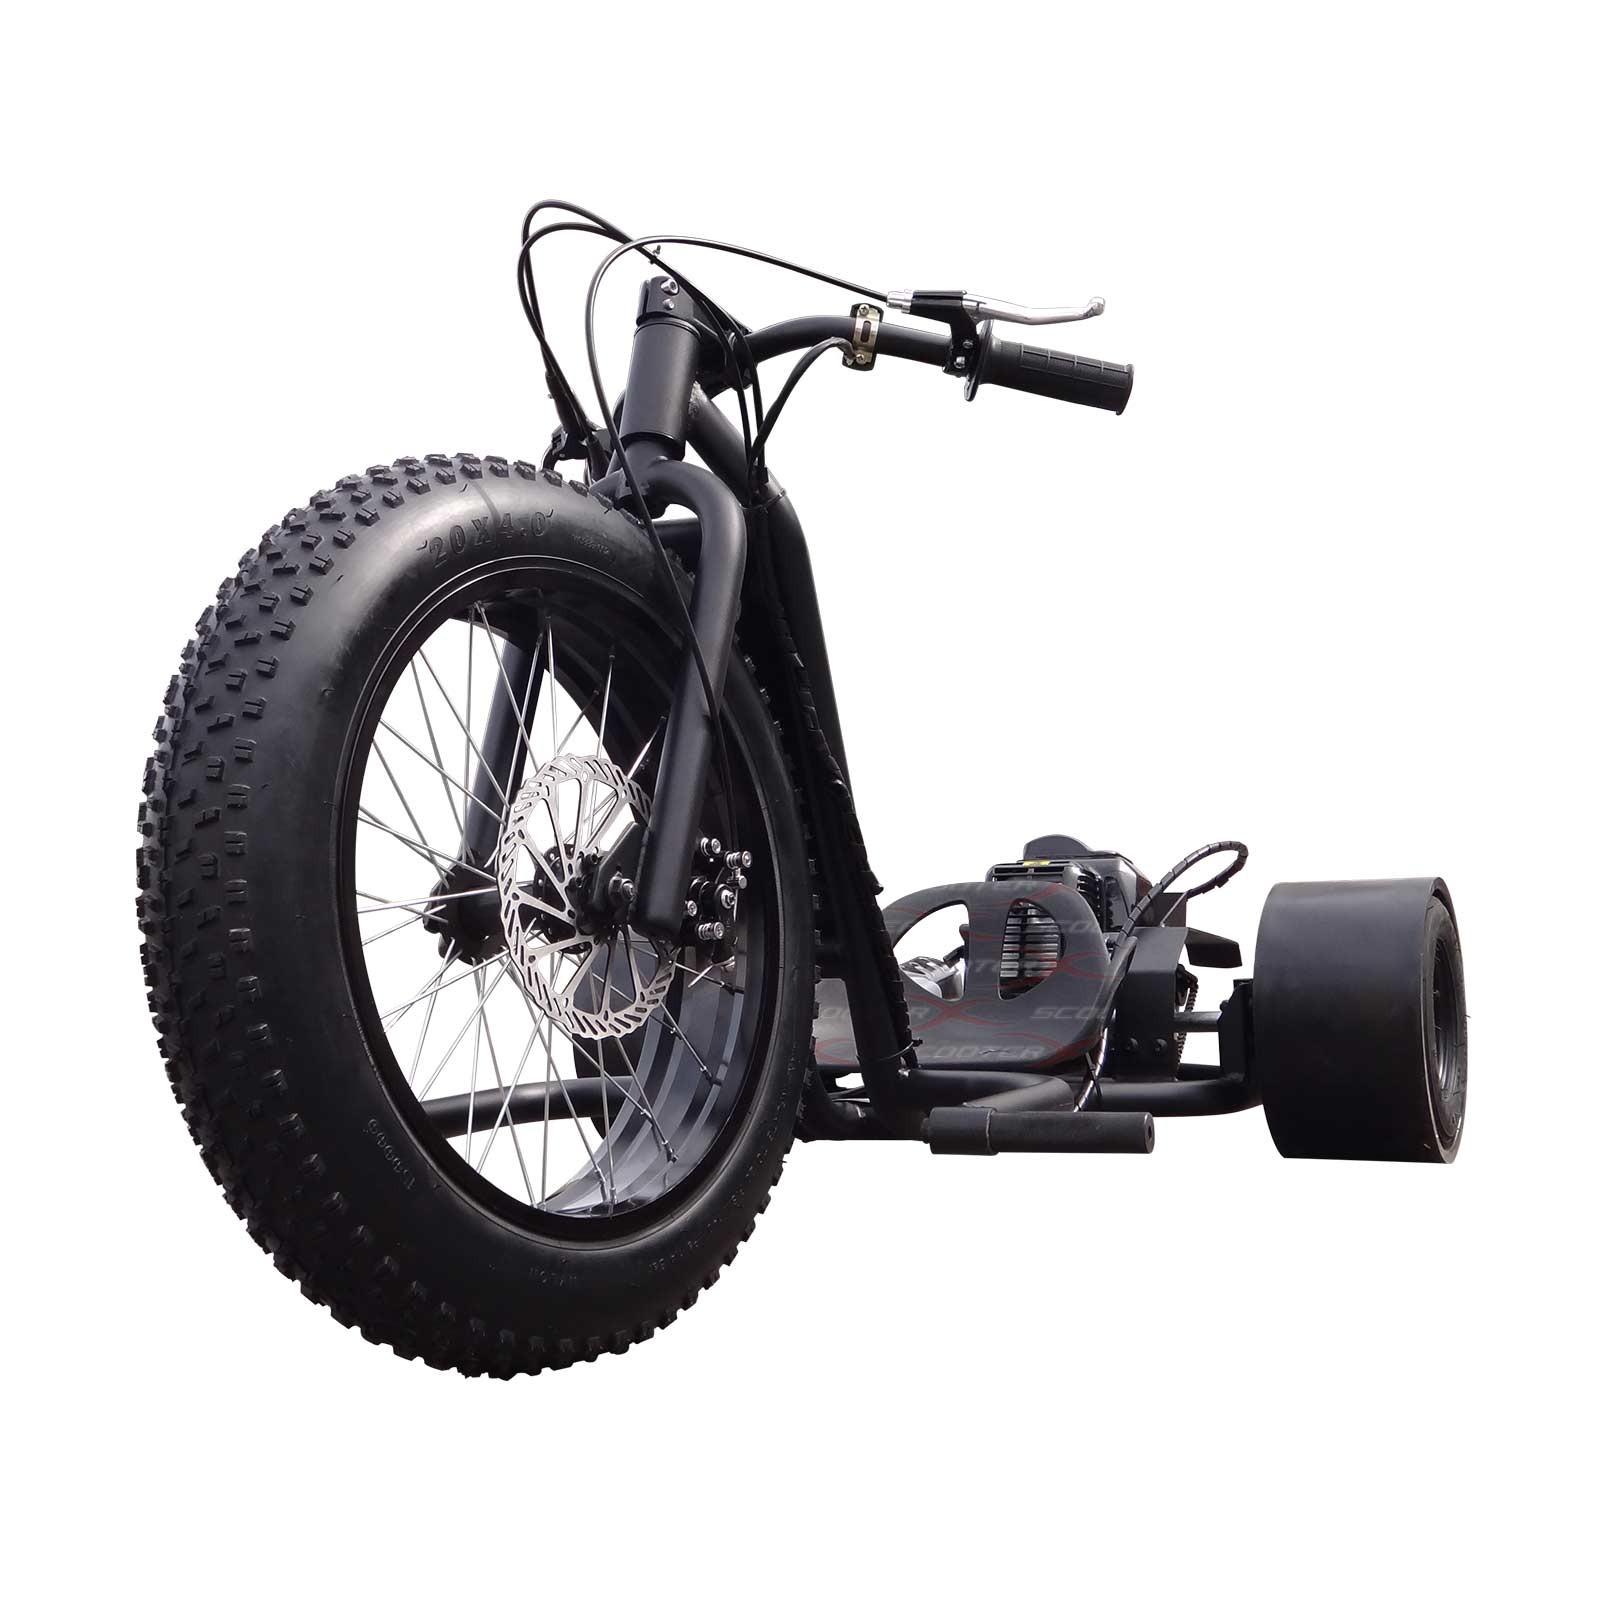 49cc Gas Powered ScooterX Driftmaster Drift Trike Big wheel